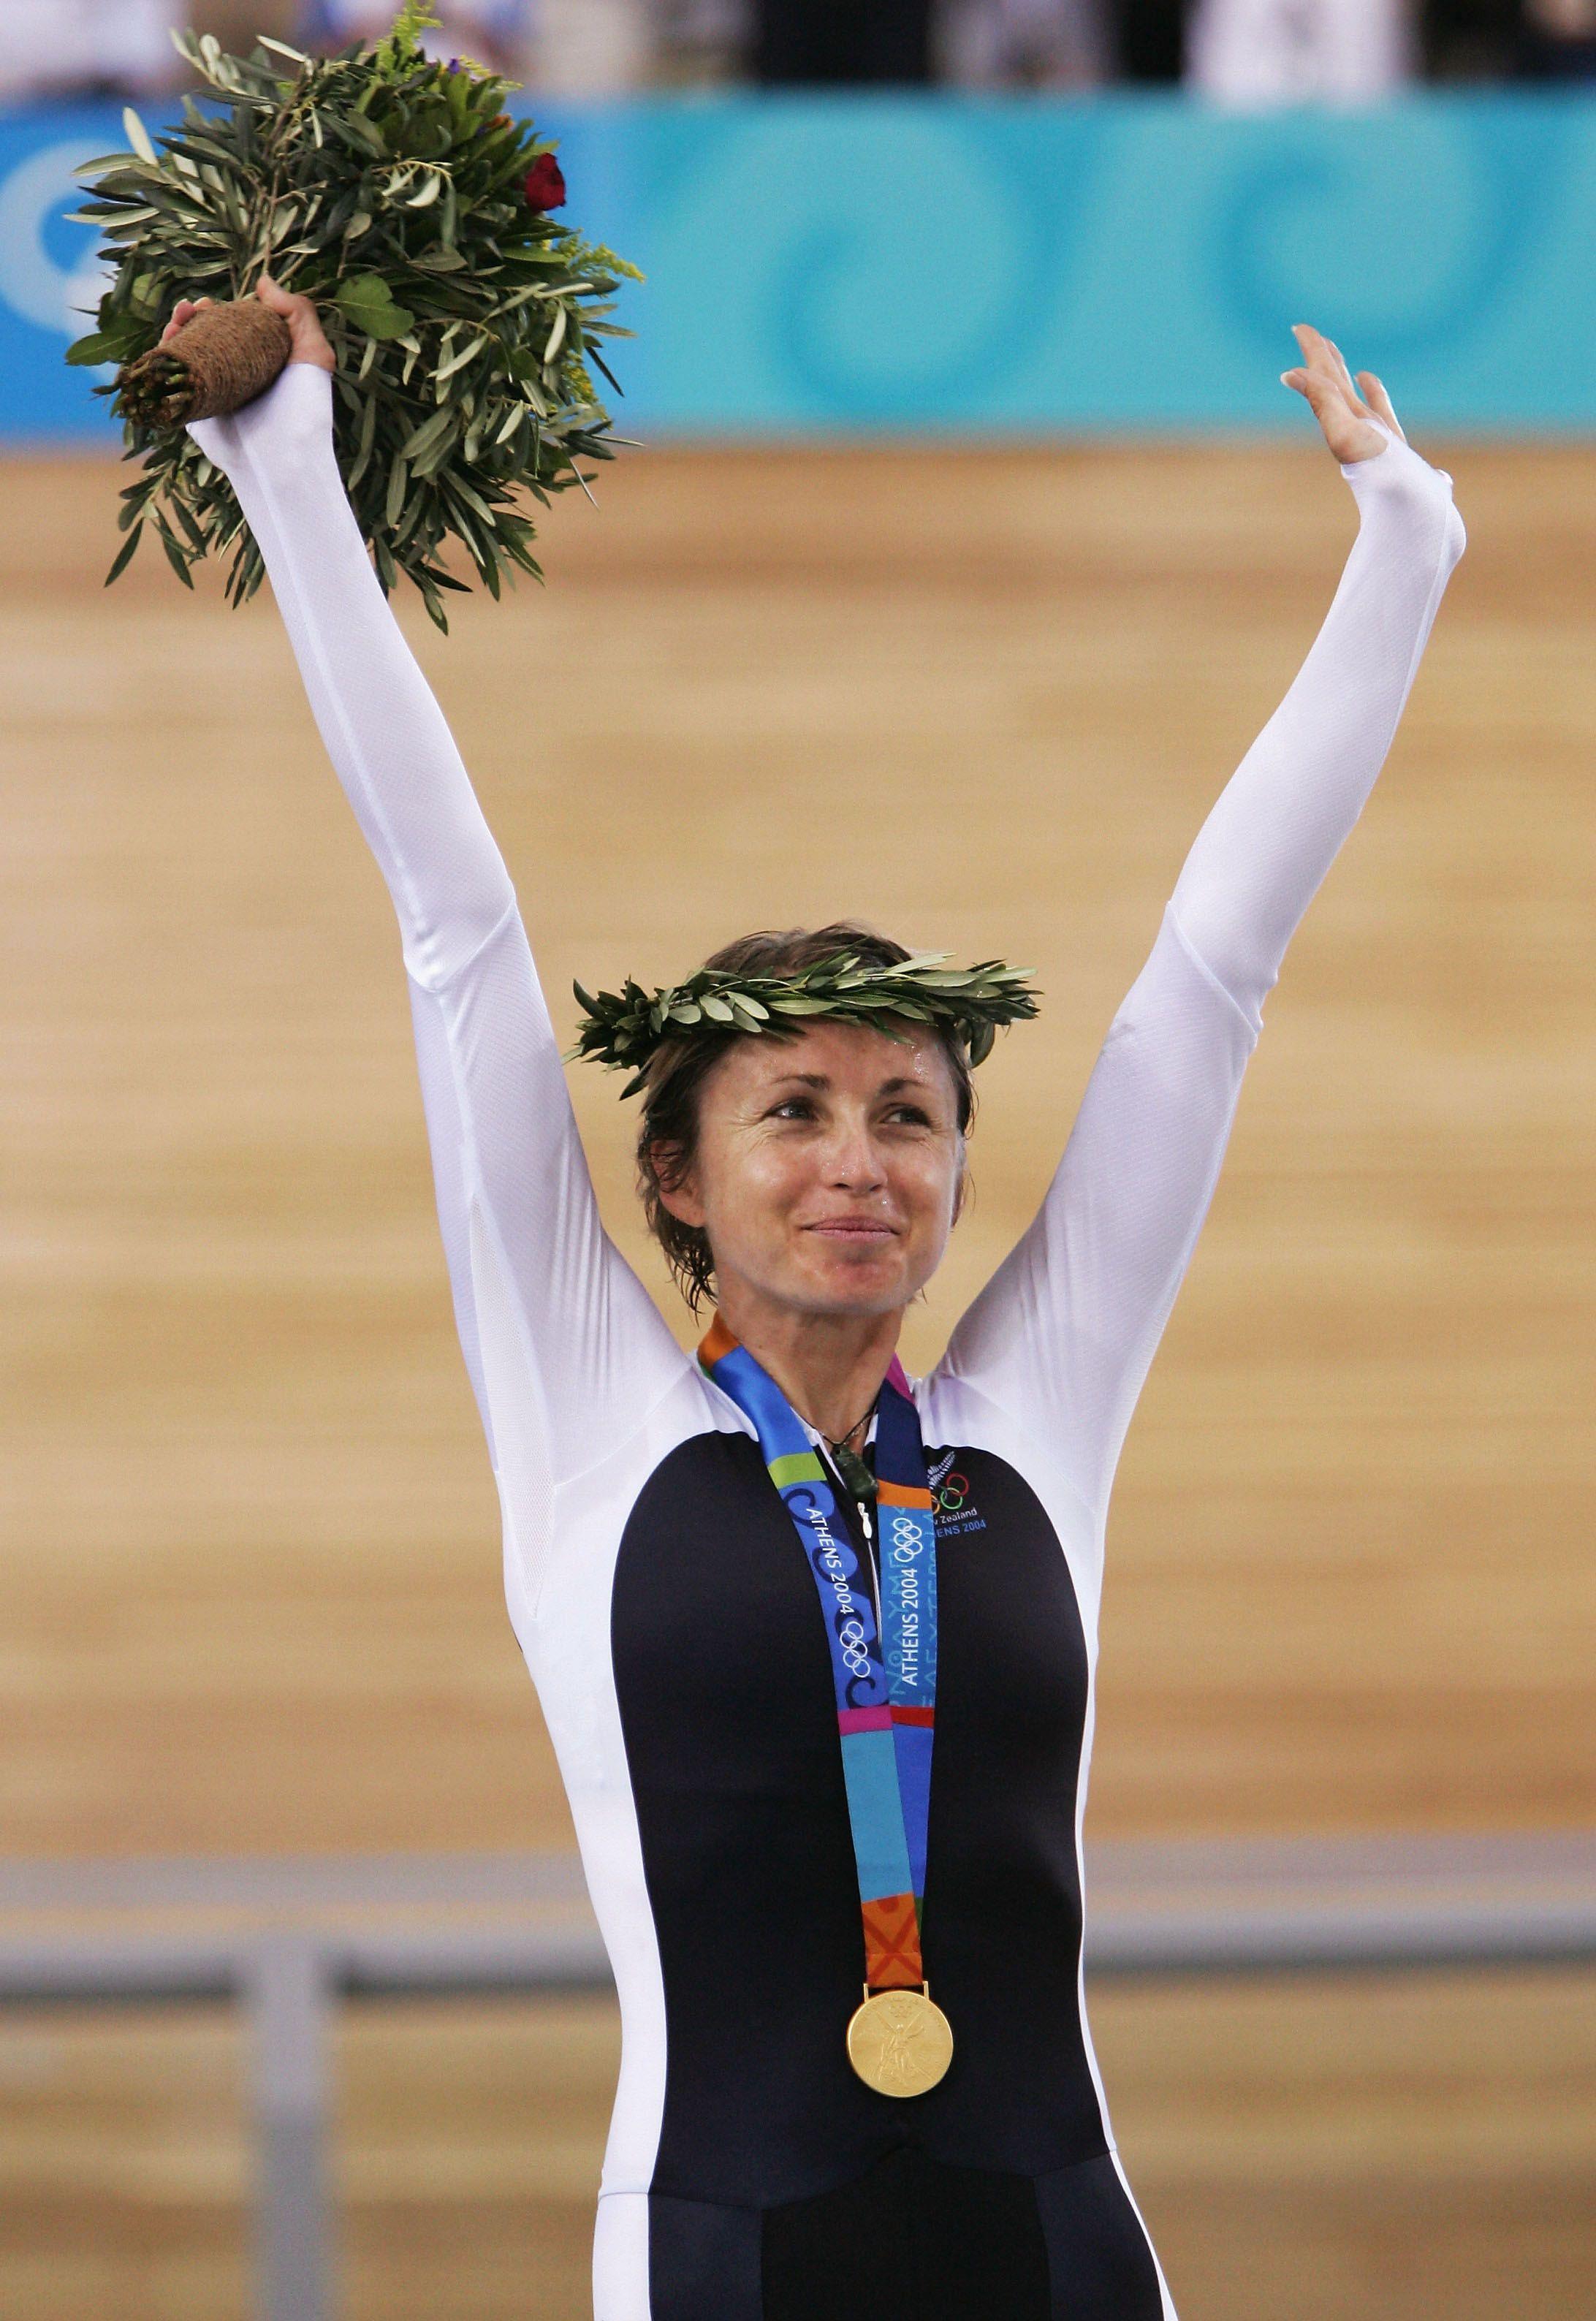 New Zealand gold medal winner Gold medal winners, Gold